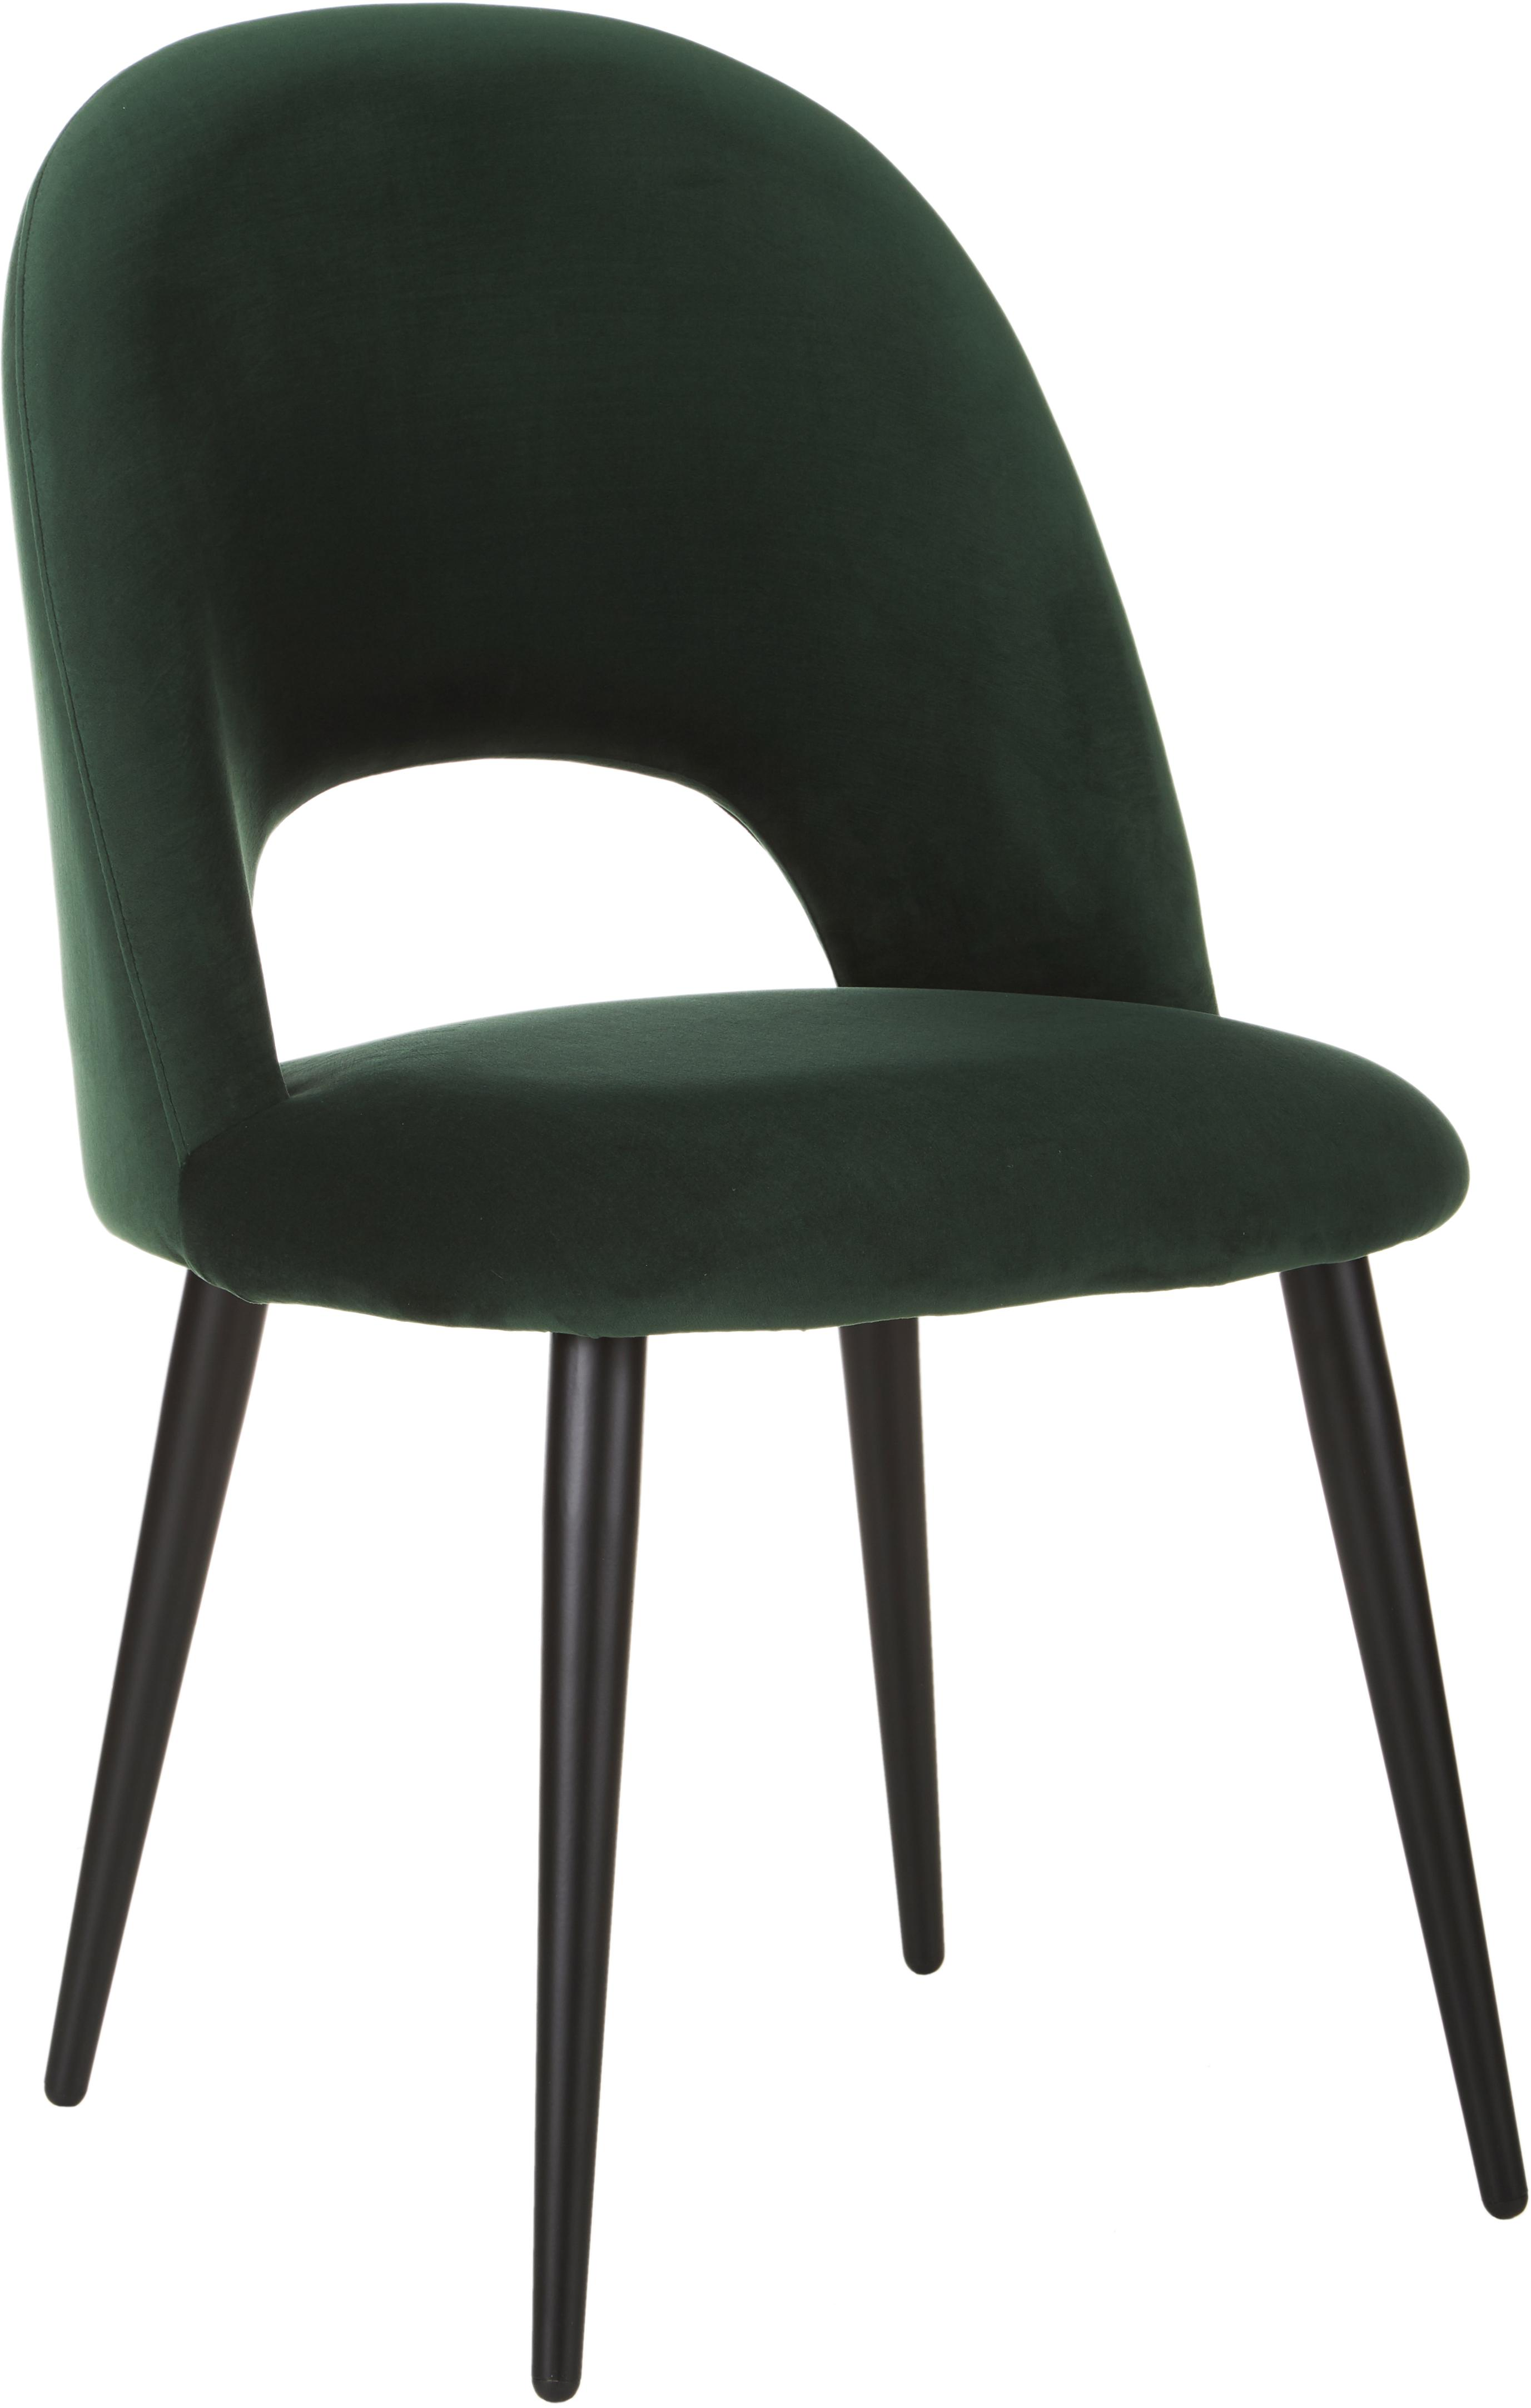 Sedia imbottita in velluto Rachel, Rivestimento: velluto (rivestimento in , Gambe: metallo verniciato a polv, Verde scuro, Larg. 53 x Prof. 57 cm